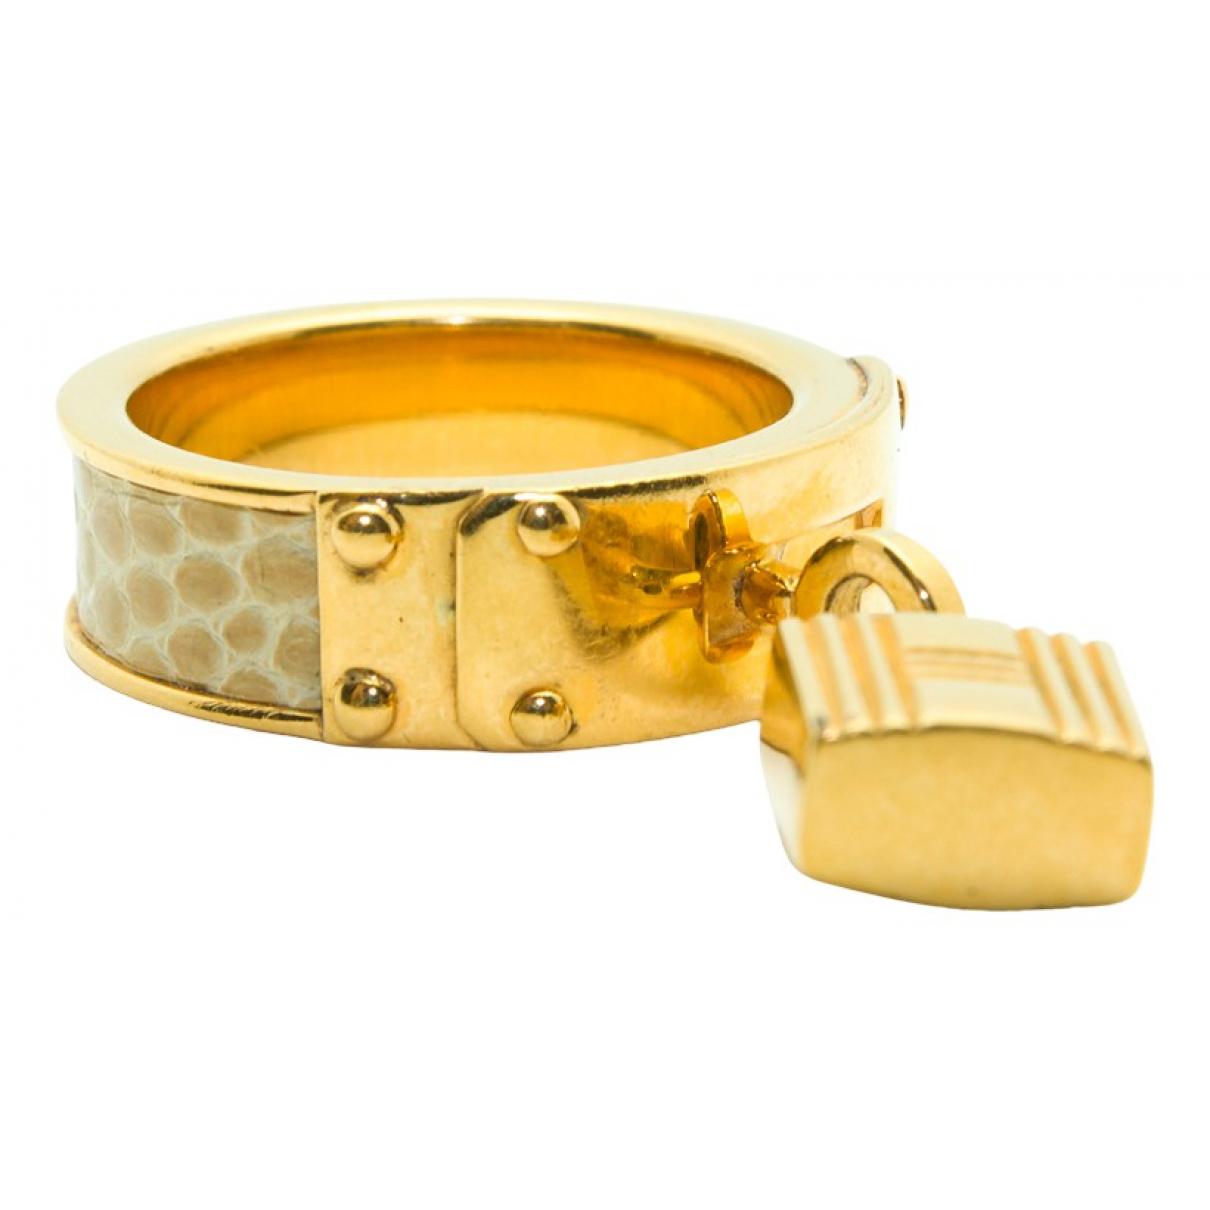 Hermes Cadenas Ring in  Gold Metall